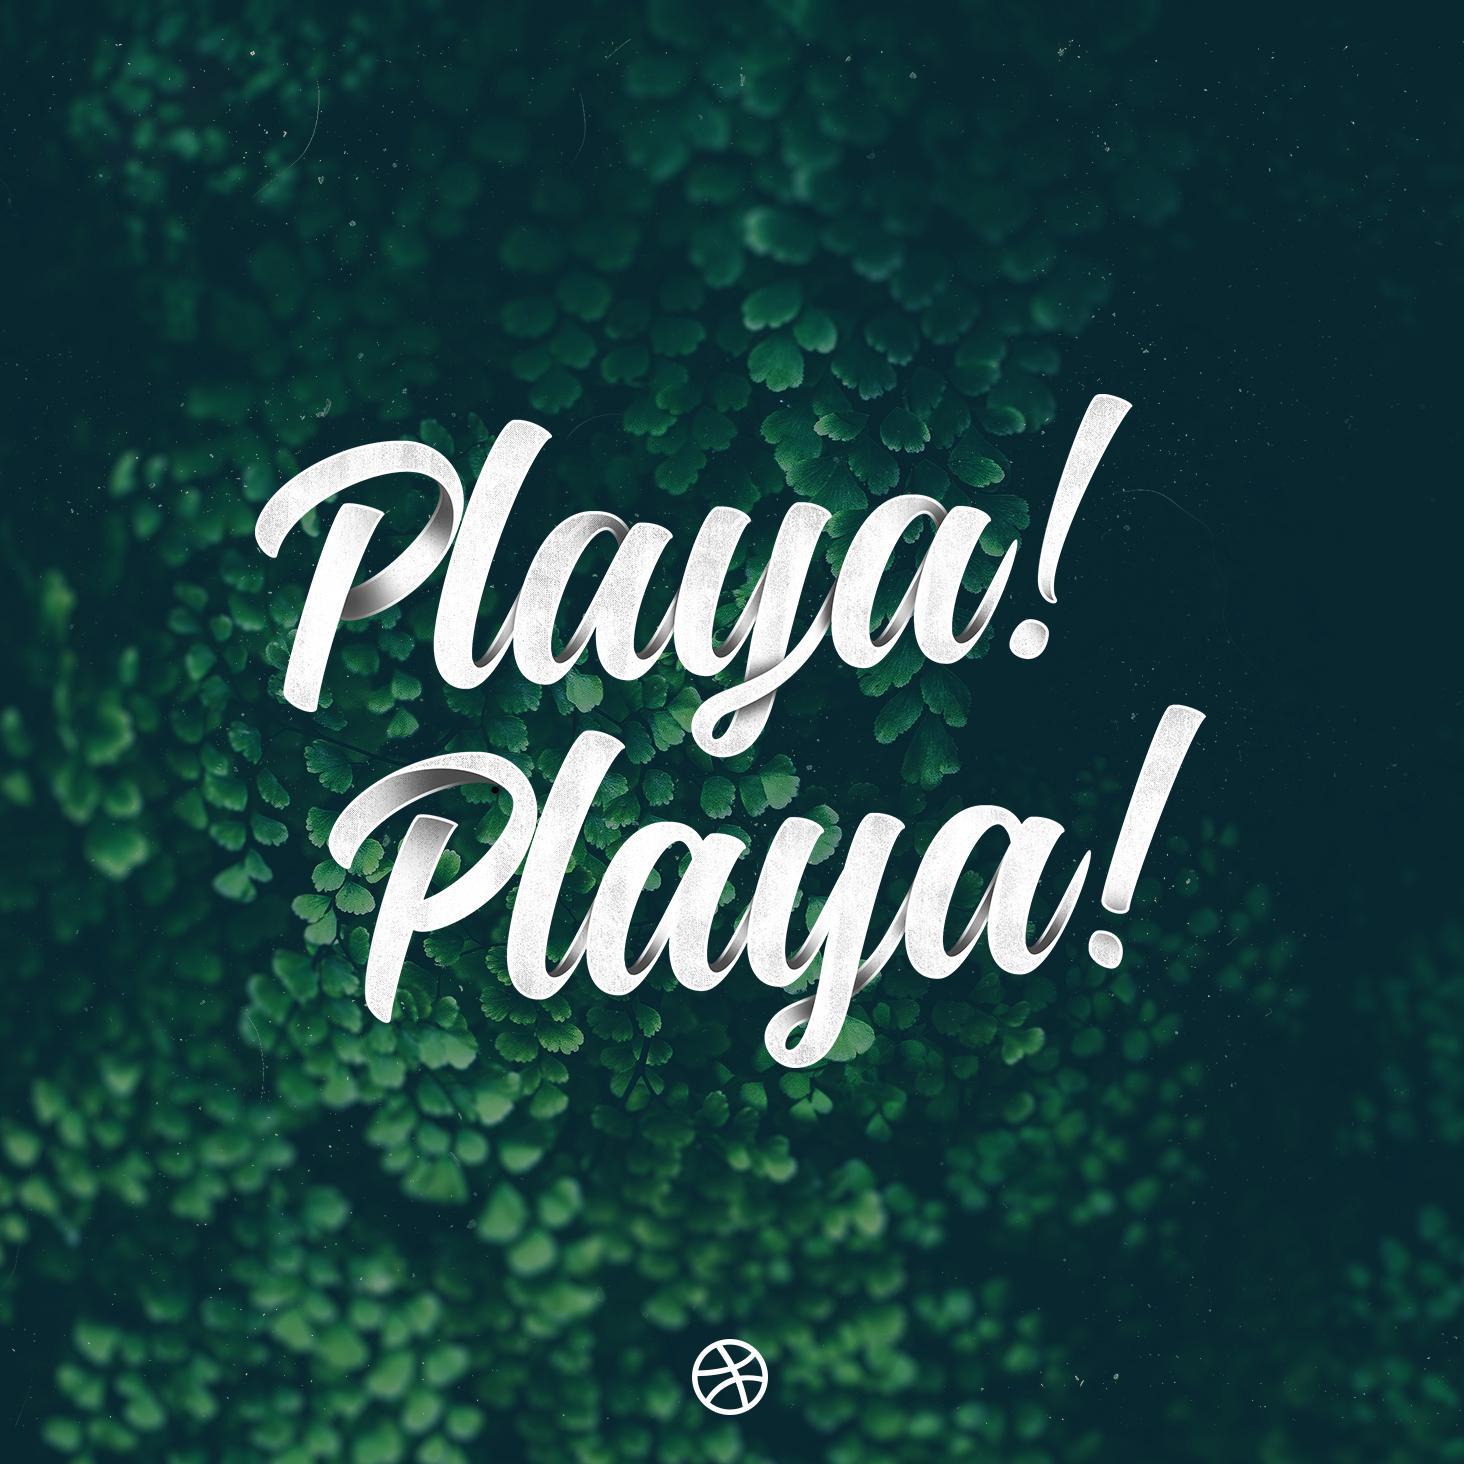 Playa! Playa! – Dribbble Debut